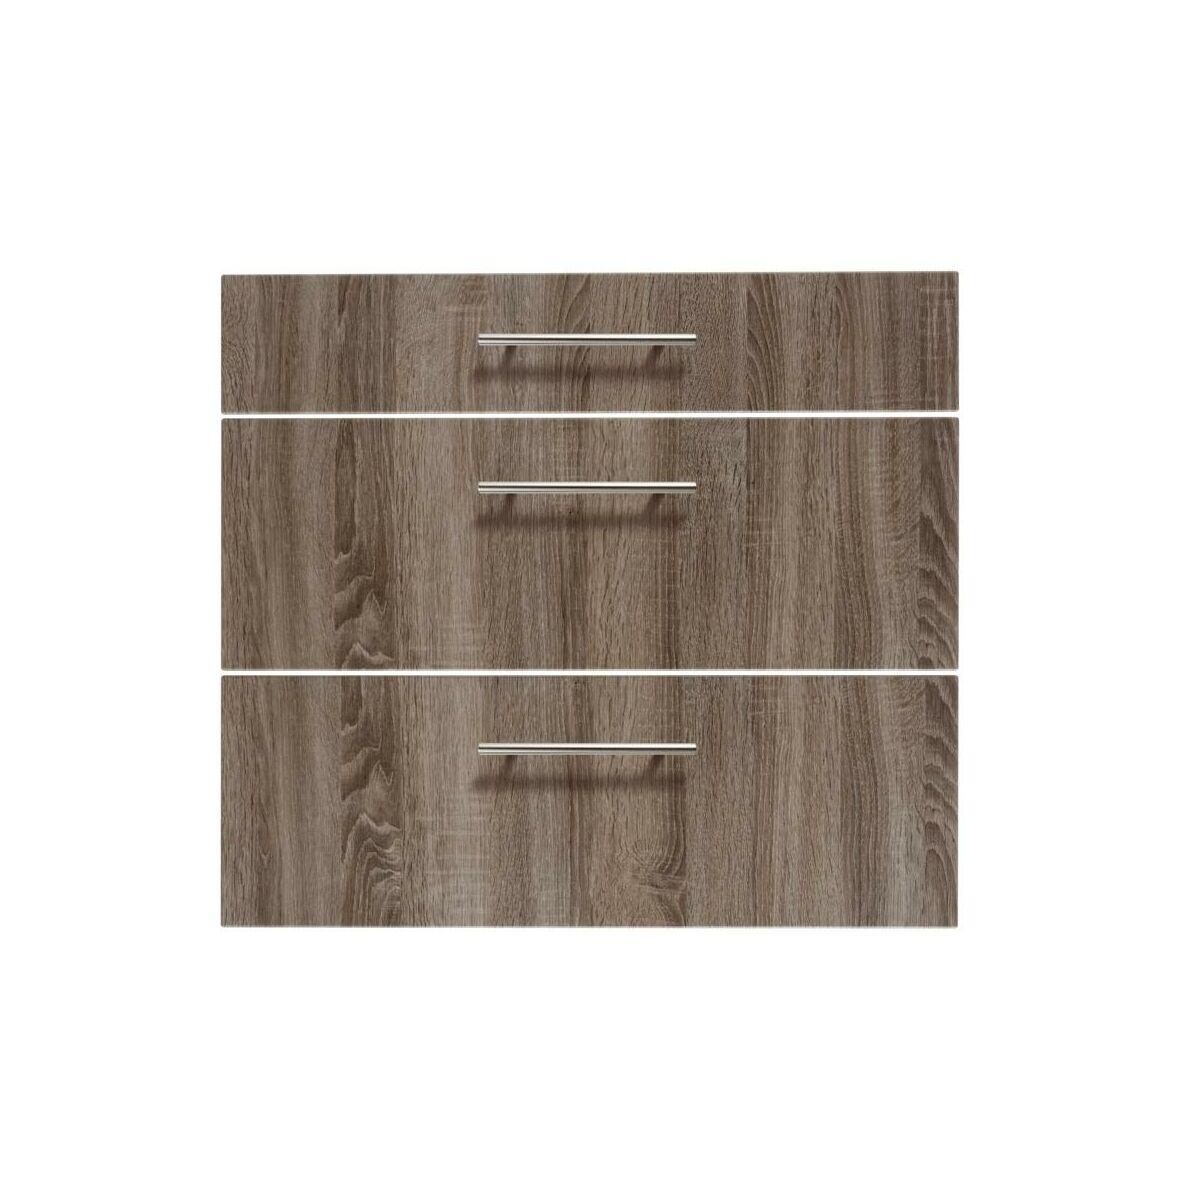 front 3d80 attraction arles delinia fronty delinia w. Black Bedroom Furniture Sets. Home Design Ideas